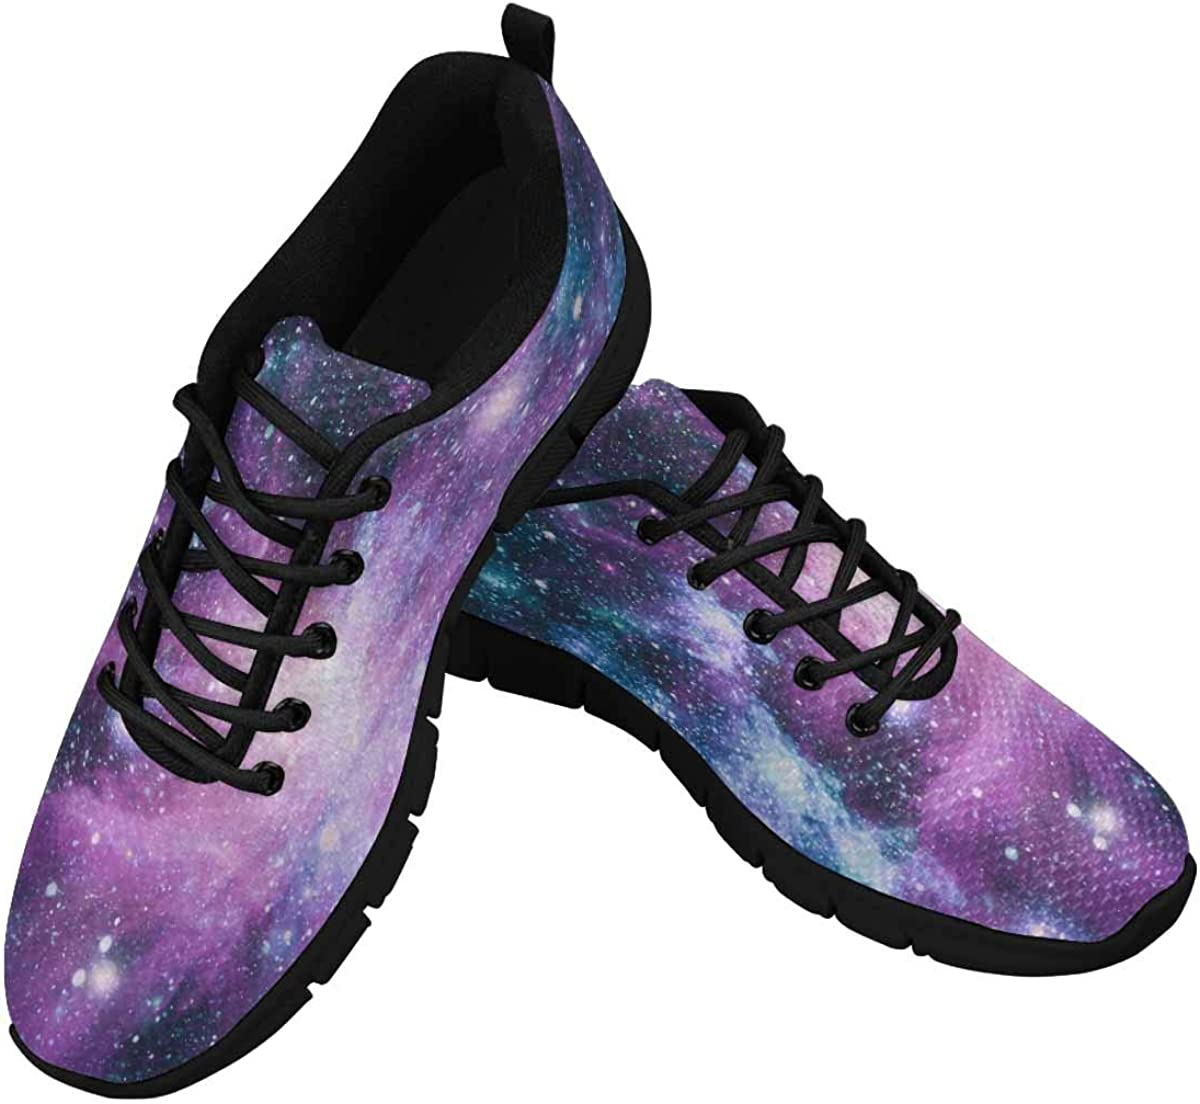 InterestPrint Galaxy Universe Nebula Pattern Women's Athletic Walking Shoes Breathe Comfort Mesh